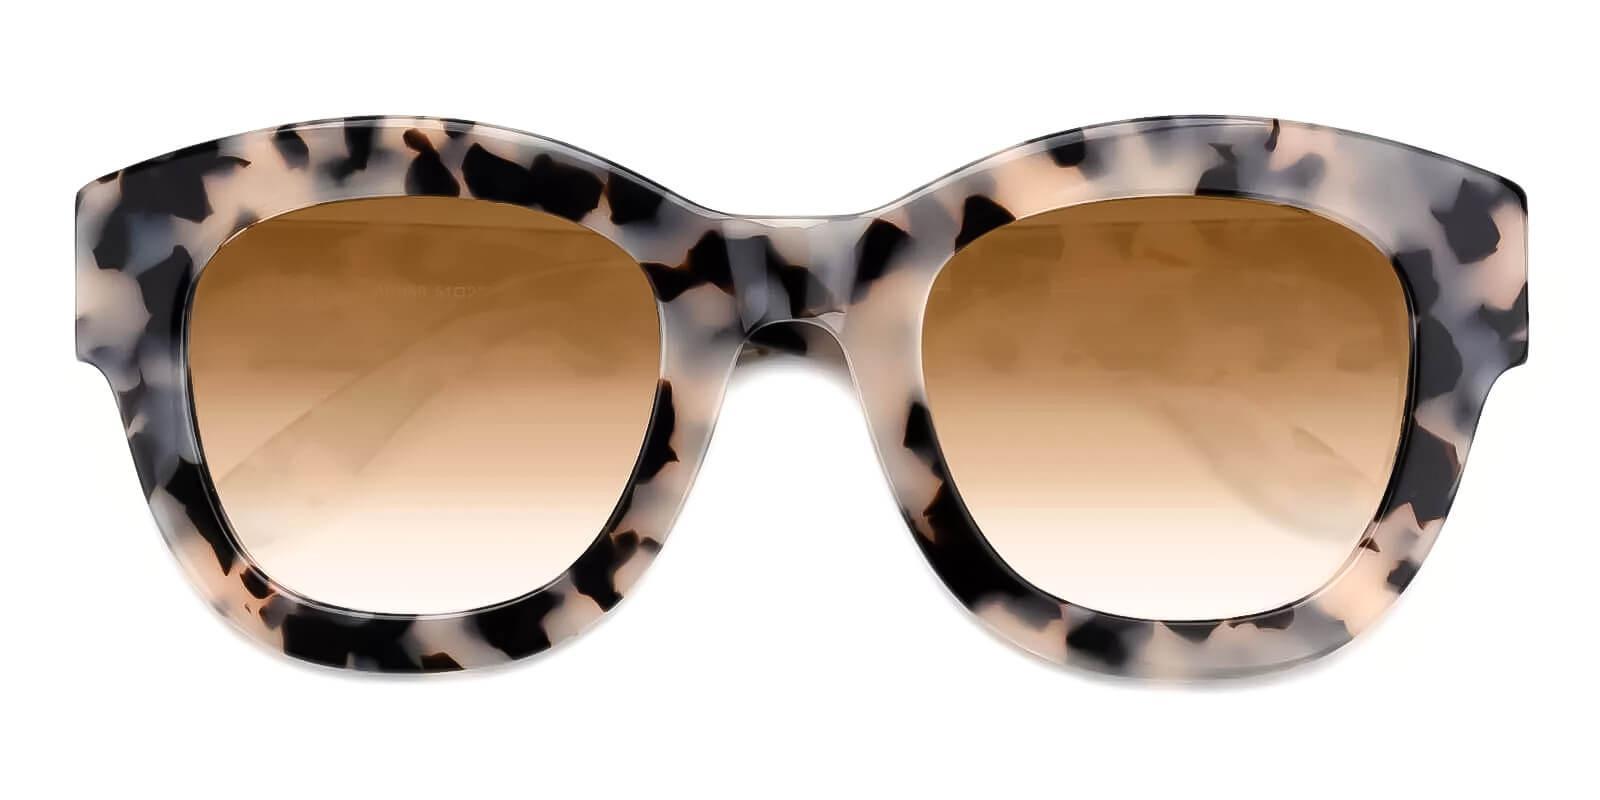 Meridian Pink Acetate Fashion , Sunglasses , UniversalBridgeFit Frames from ABBE Glasses